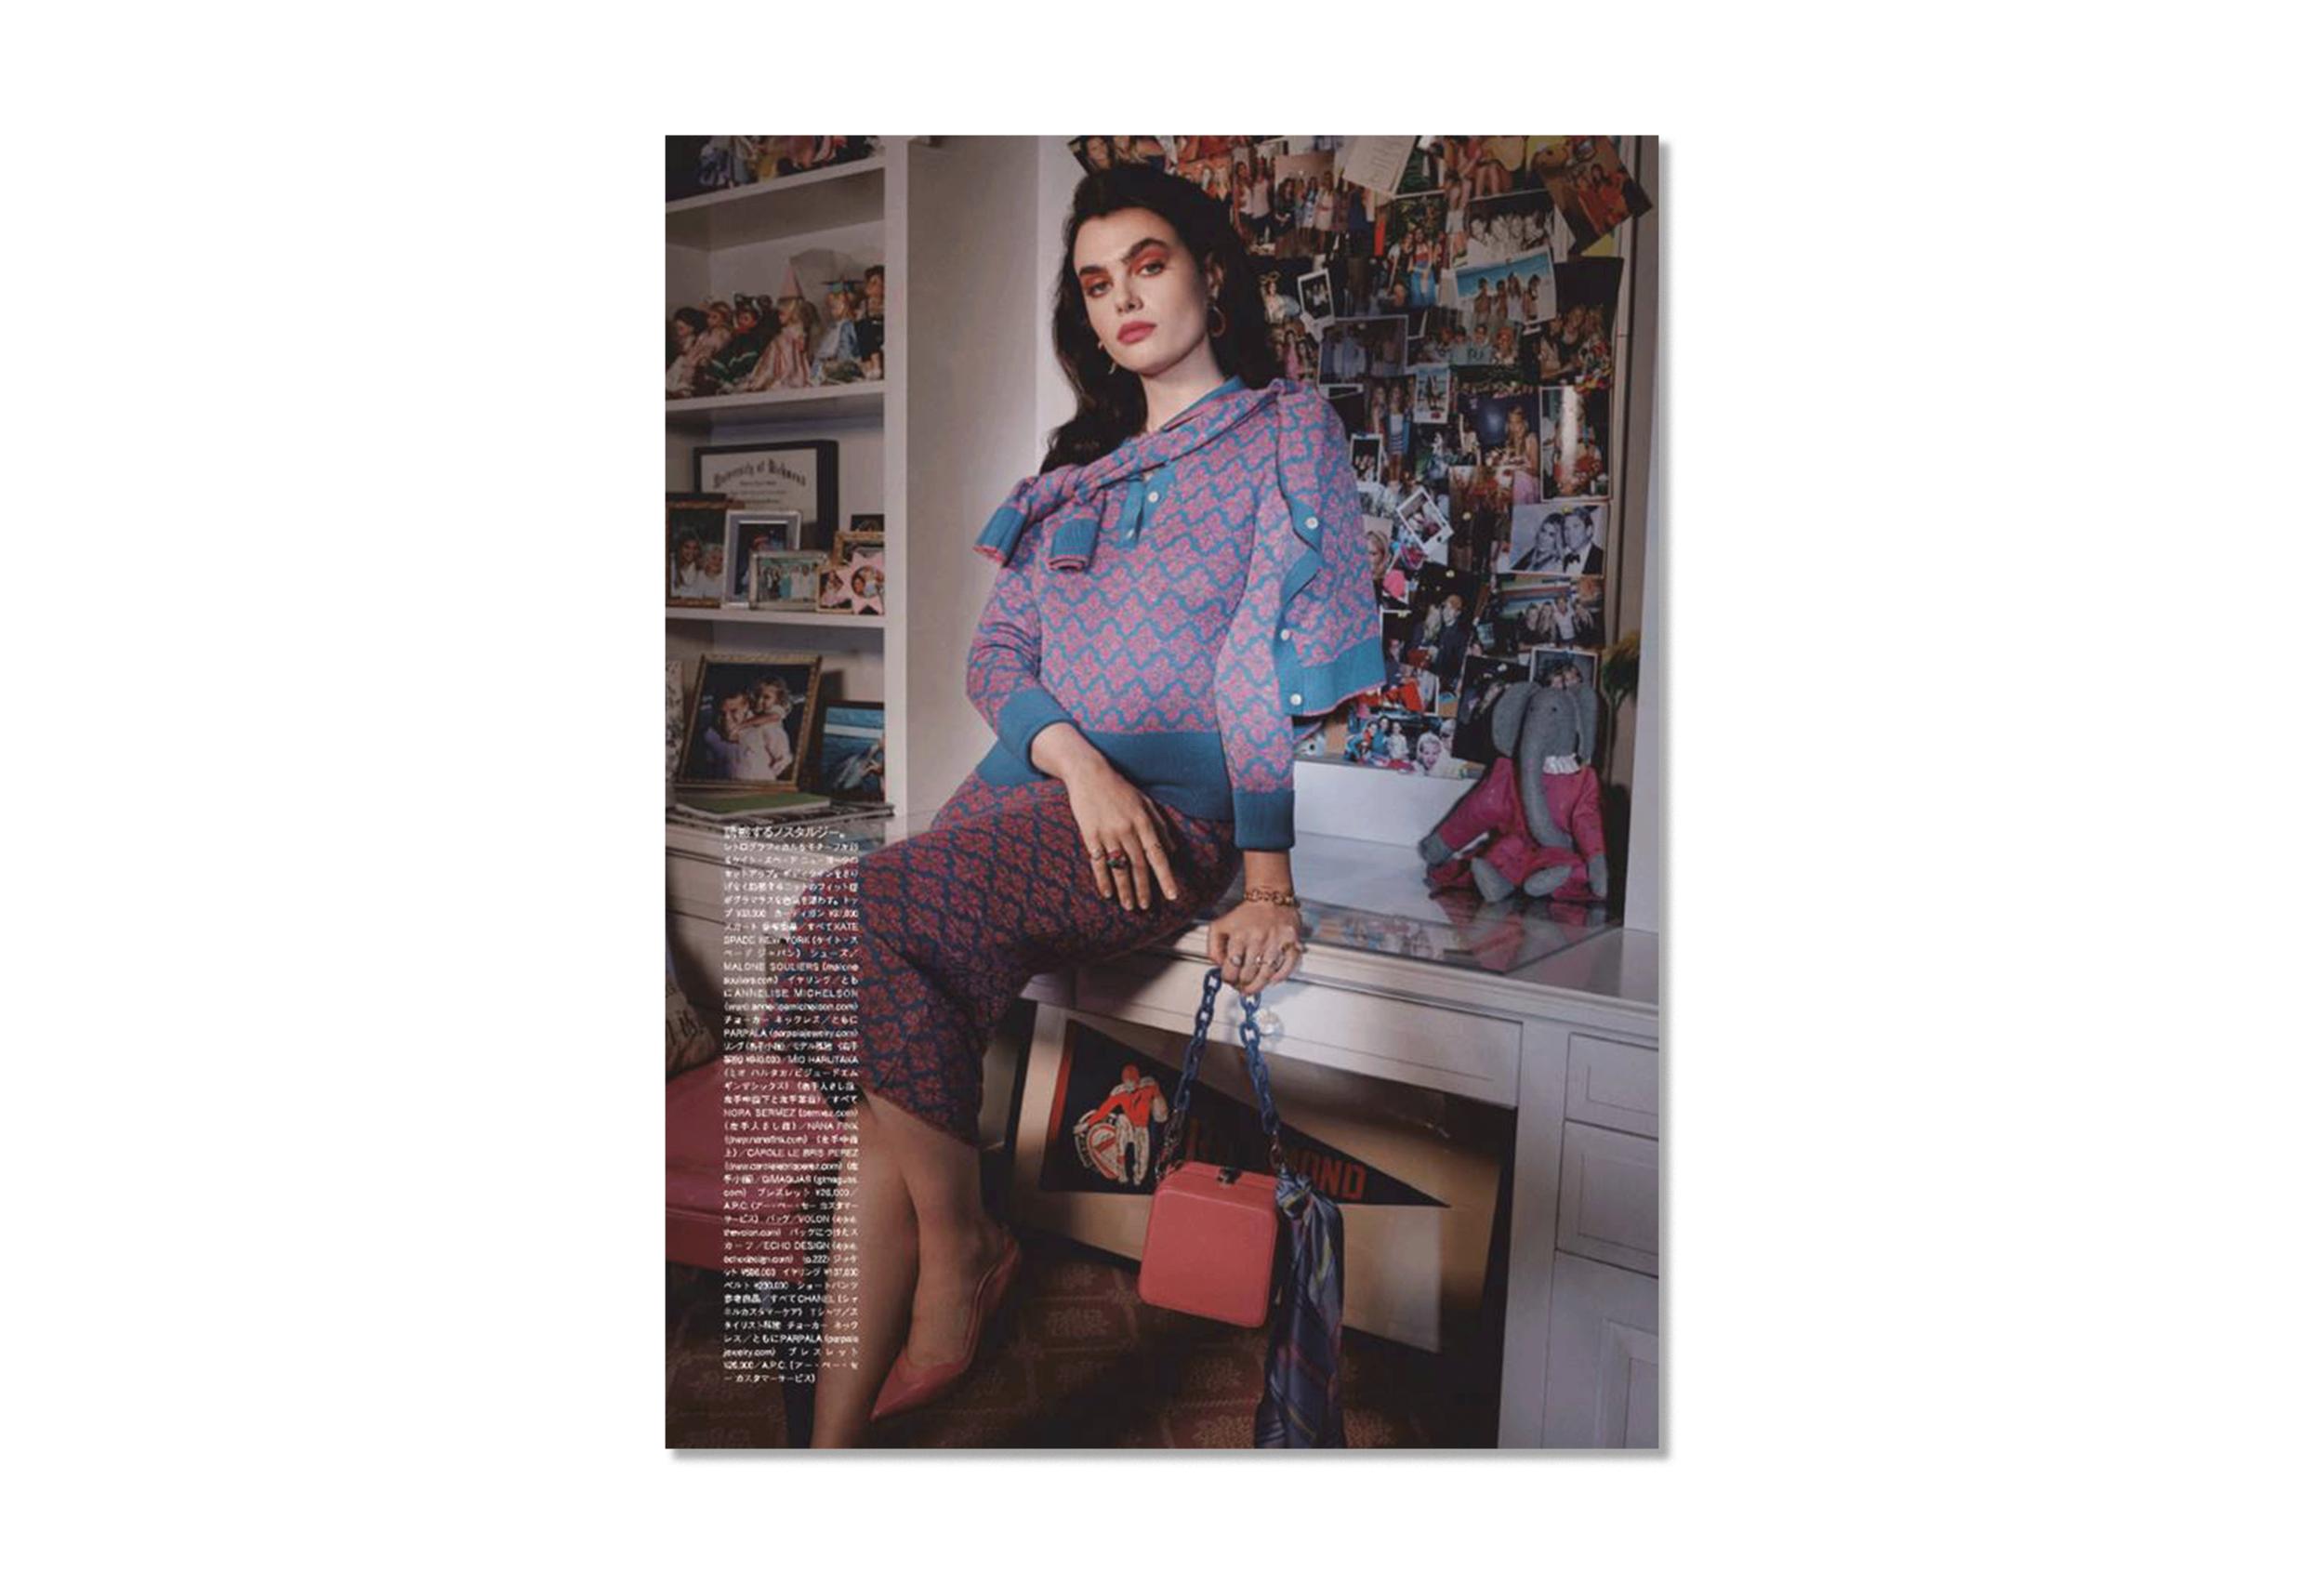 20190330_Vogue_02.png